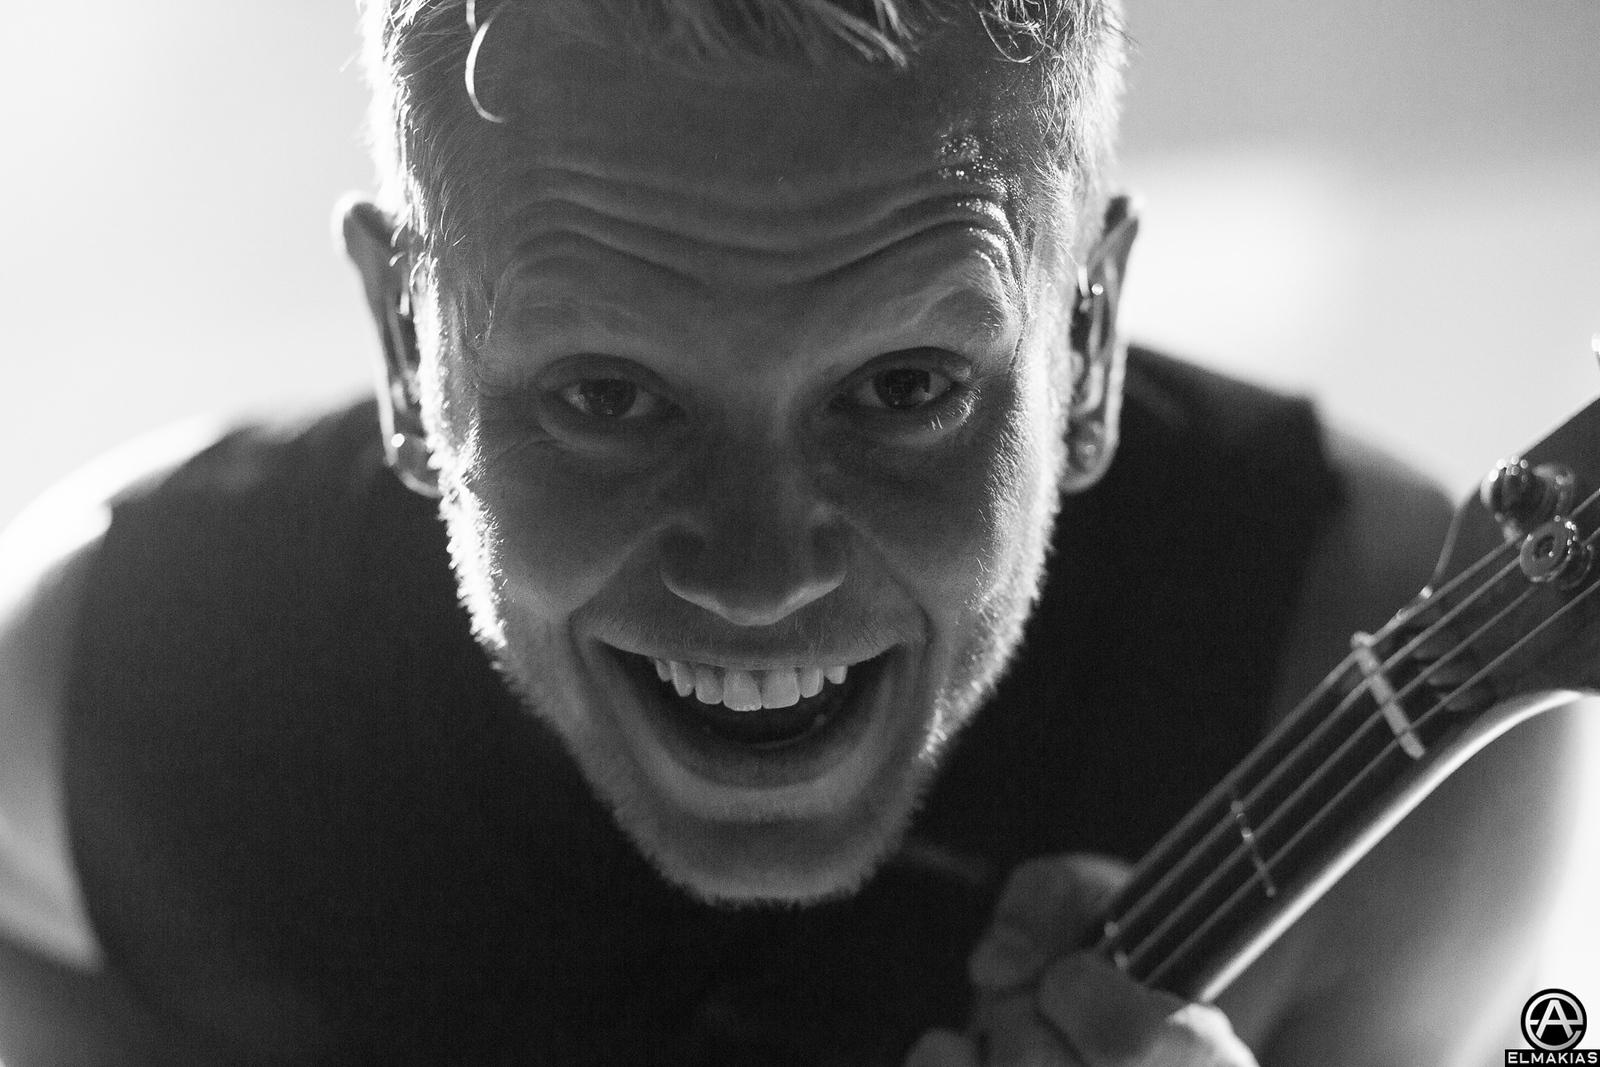 Josh Woodard up close  - Parks and Devastation Tour by Adam Elmakias